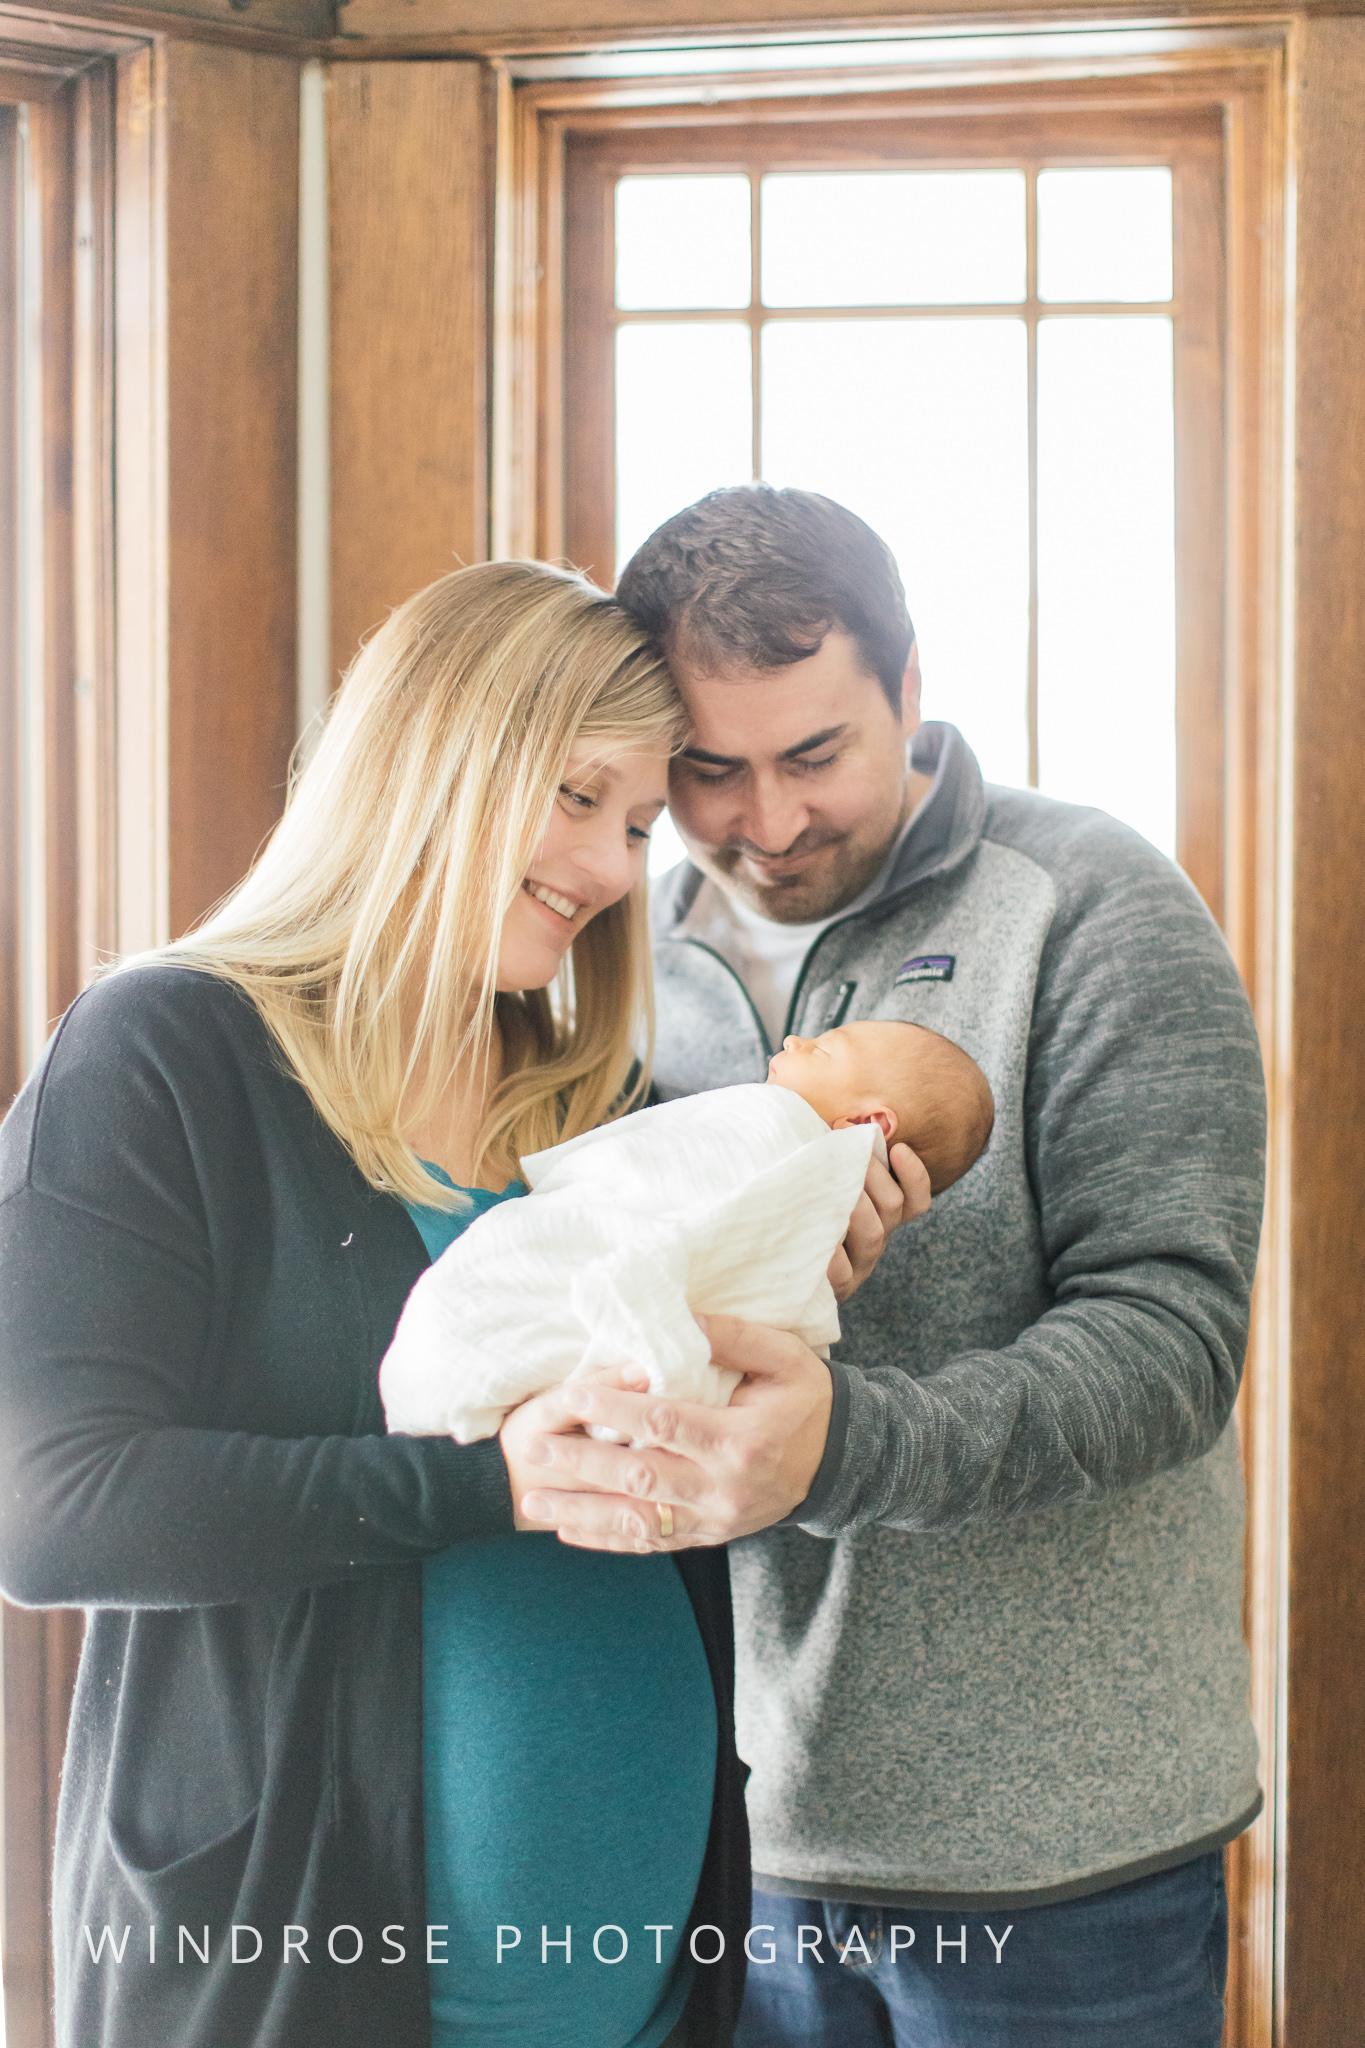 Newborn-Photography-Session-Rochester-MN-12.jpg